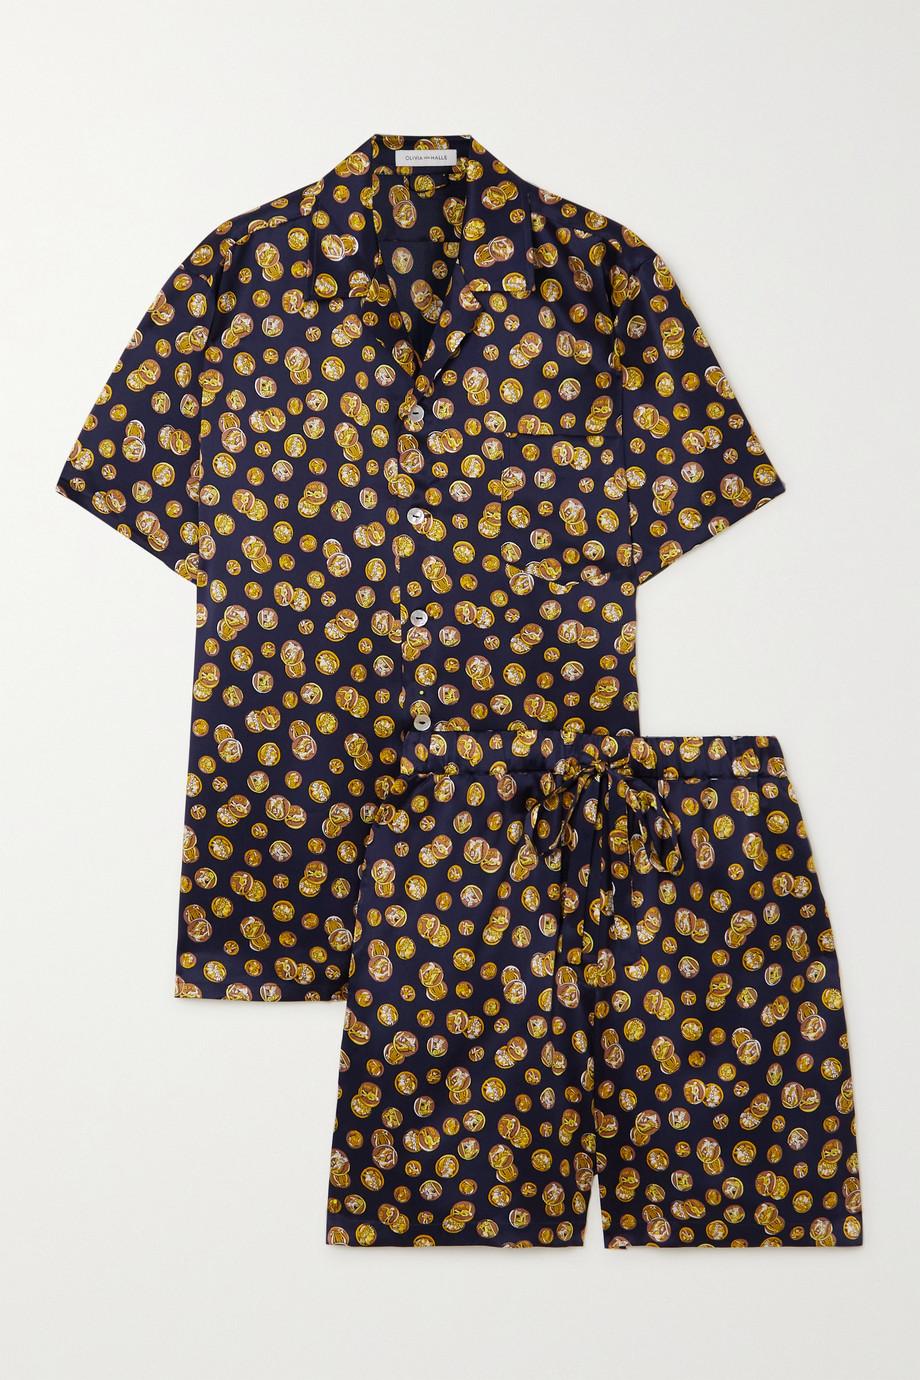 Olivia von Halle Emeli Pyjama aus bedrucktem Seidensatin